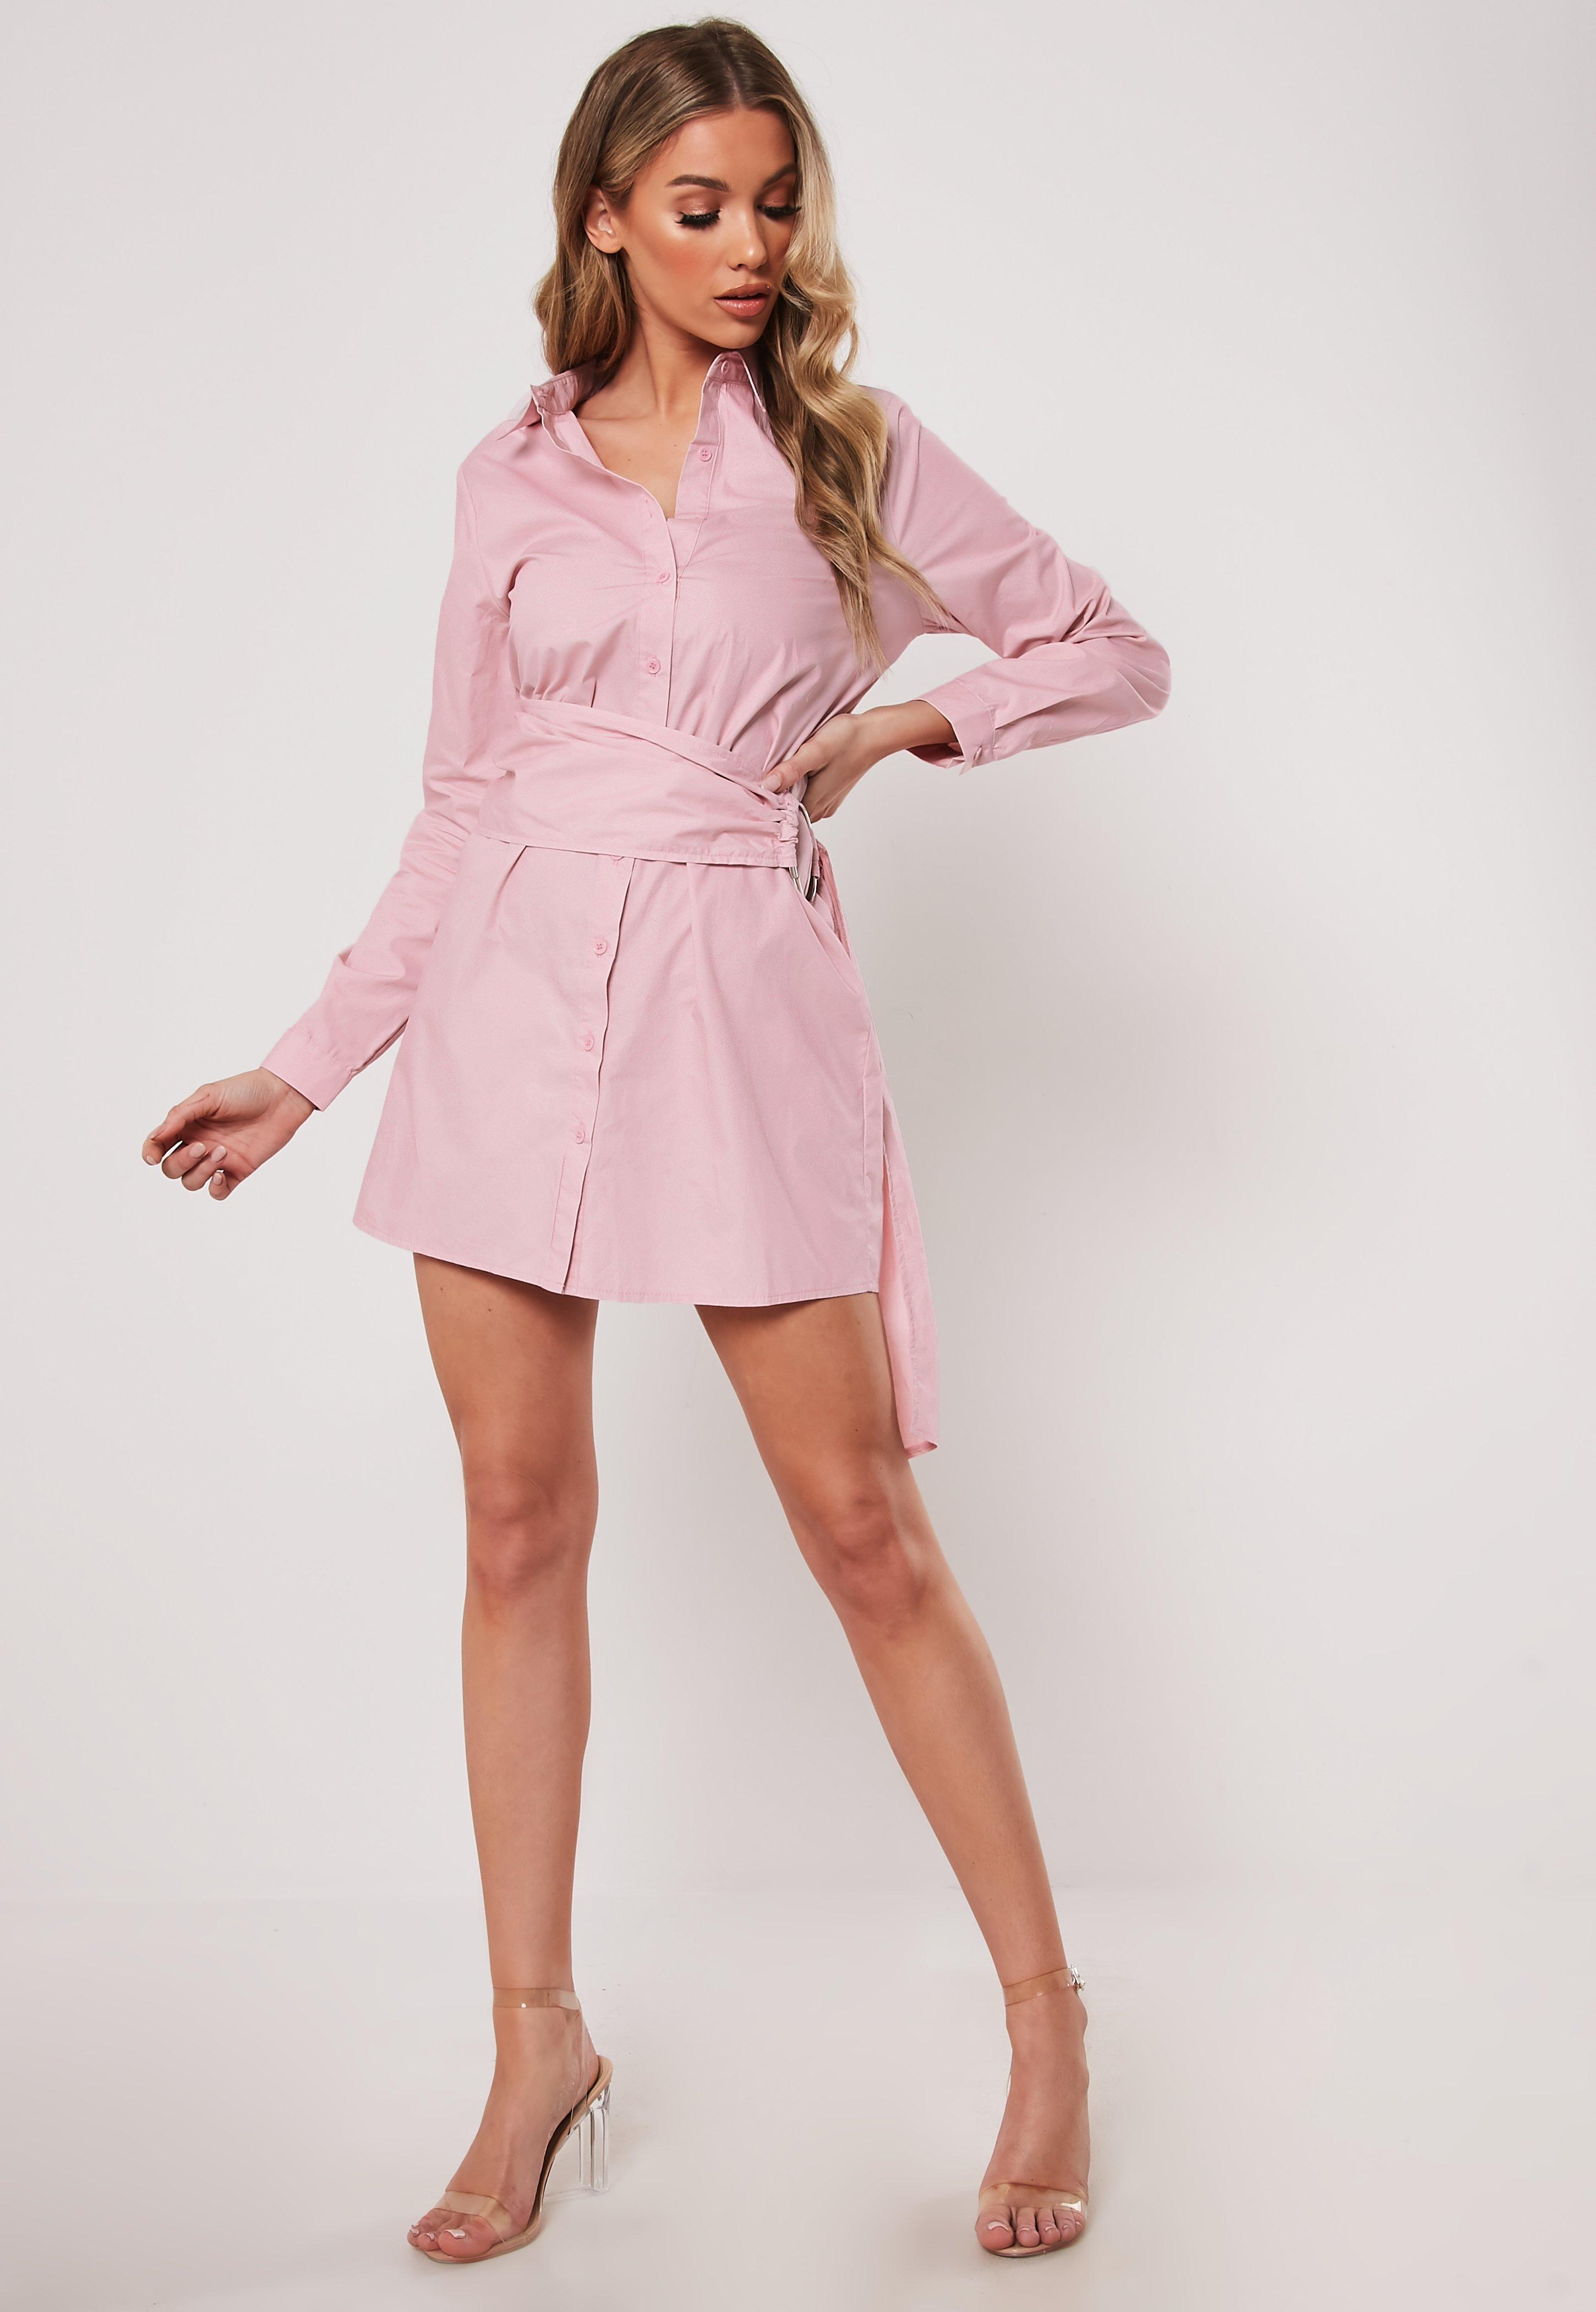 9dc55c5d624 Shirt Dresses | Long & Short Sleeve Shirt Dresses - Missguided